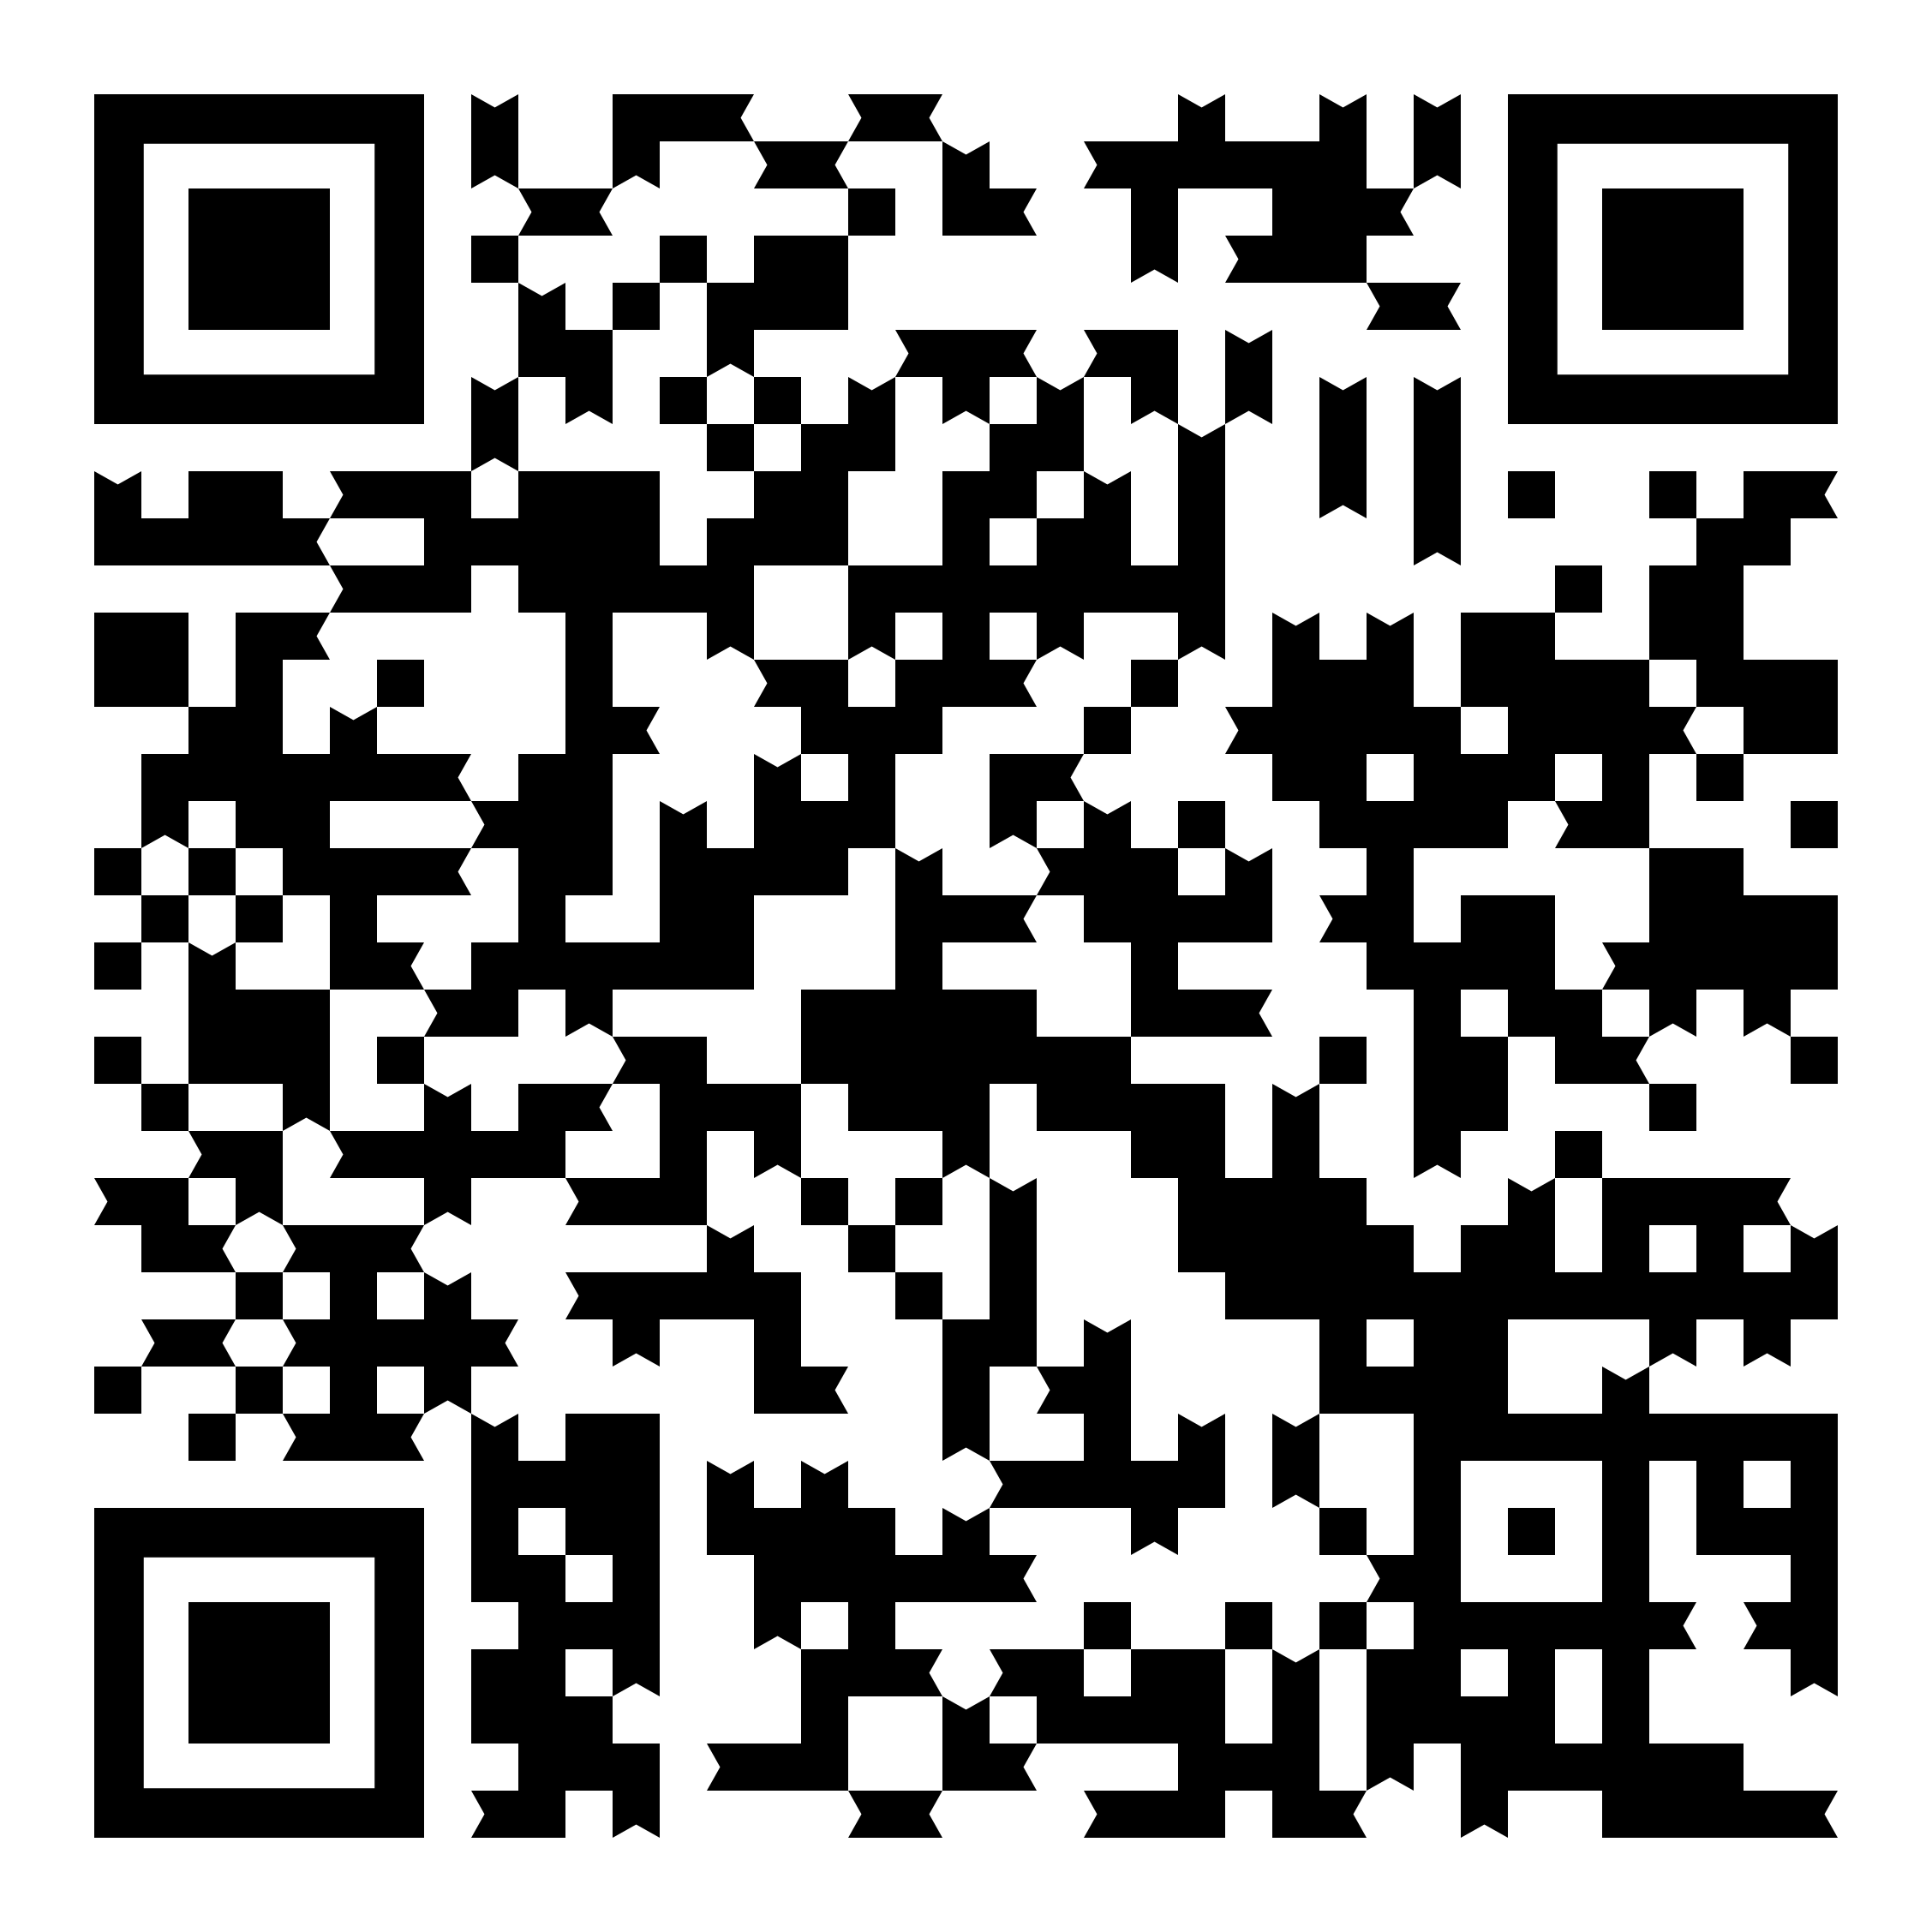 Voter Reg Form QR Code